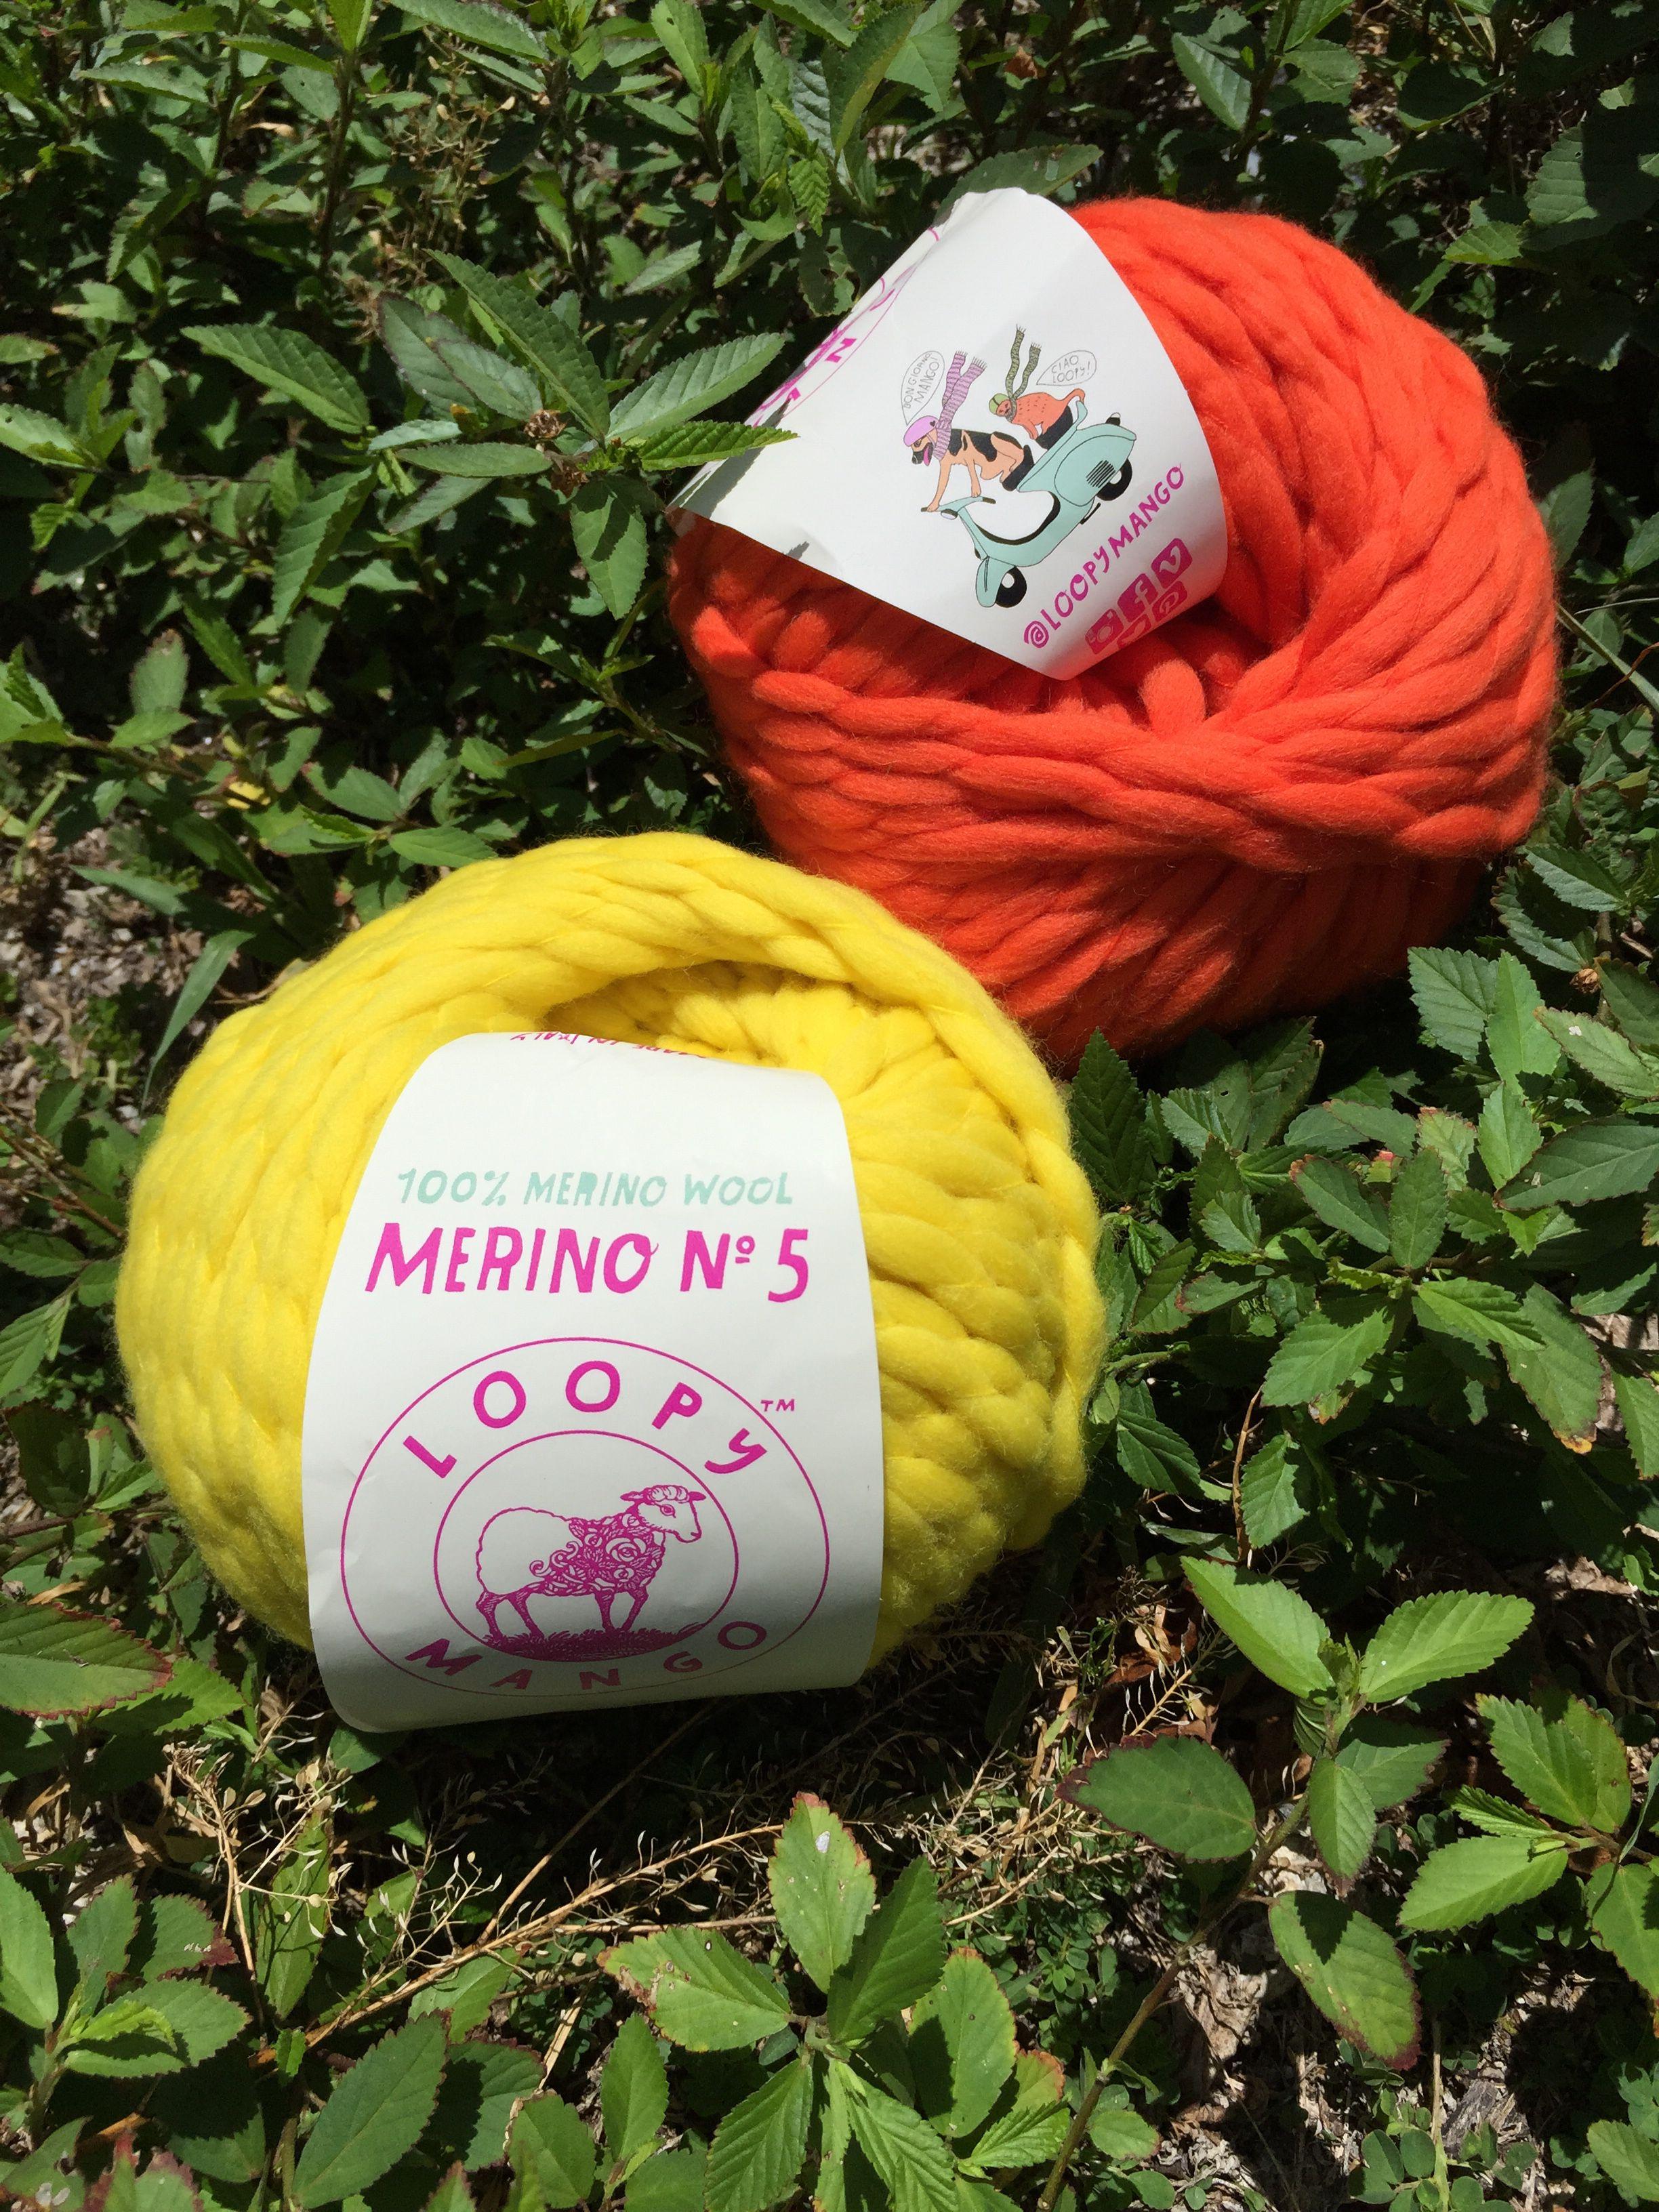 New yarn - Loopy Mango Merino No  5 - perfect for those